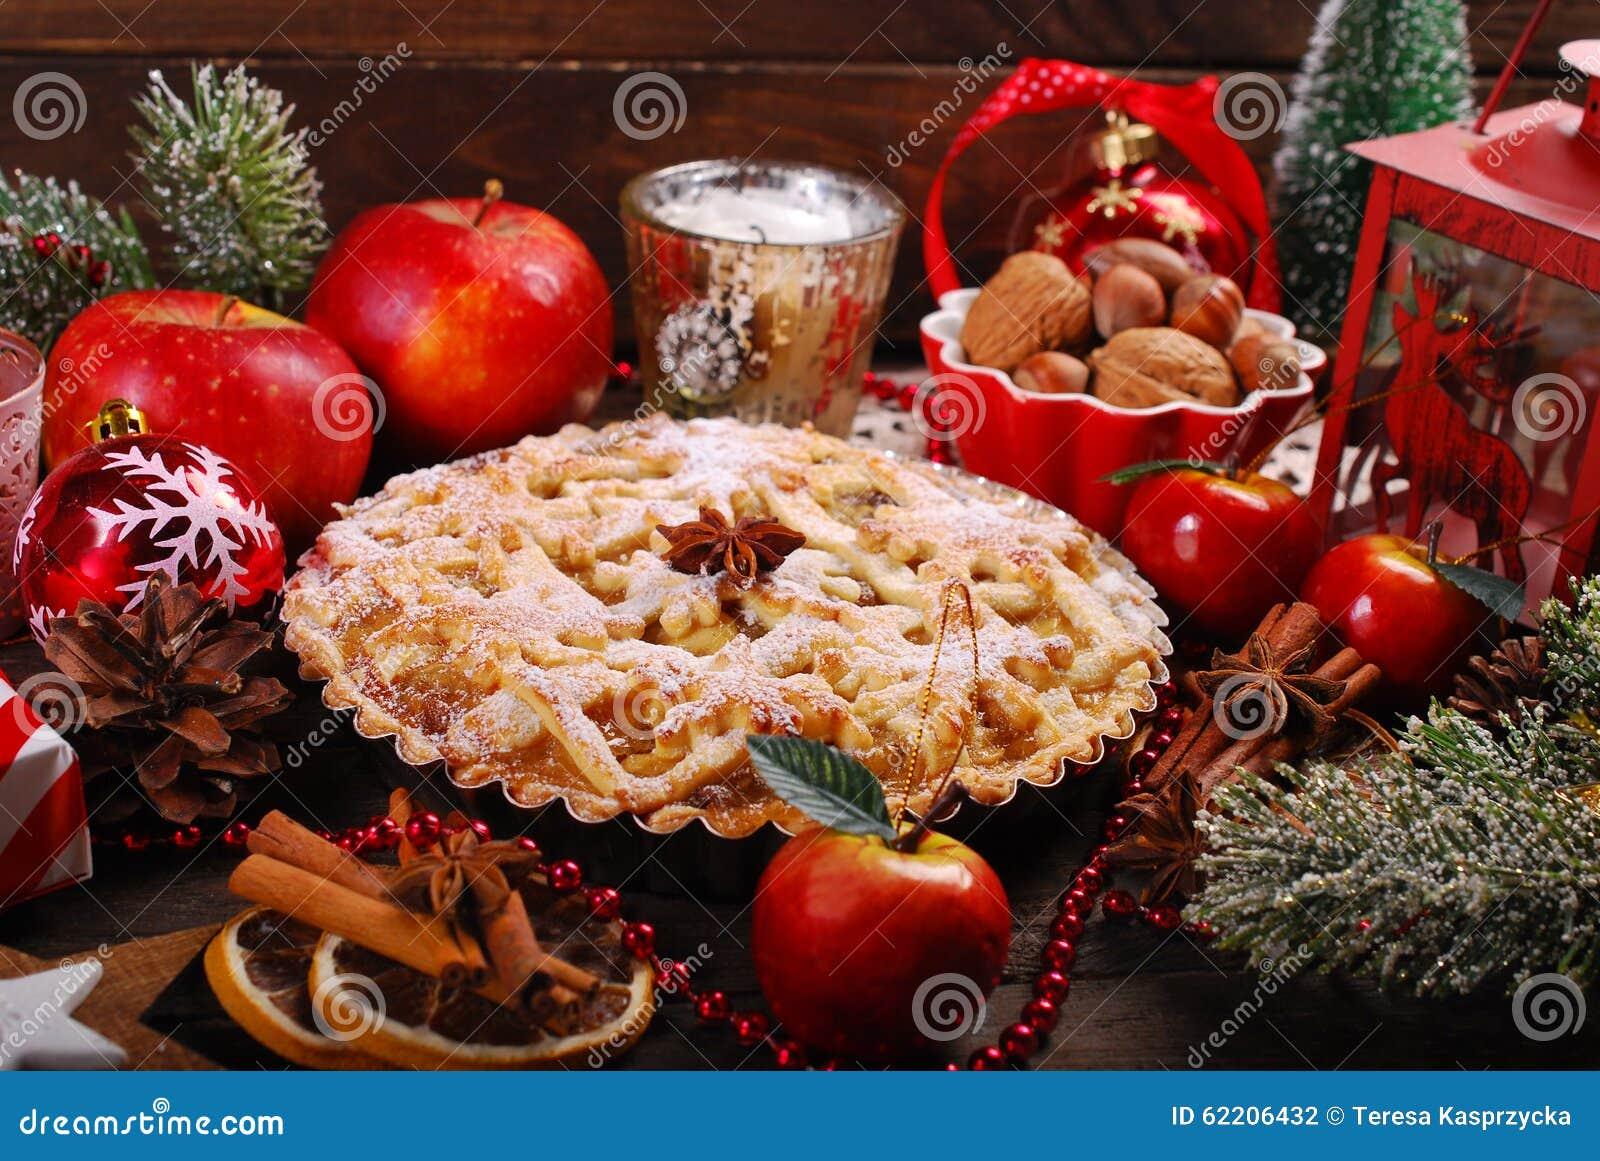 Apple Pie For Christmas Stock Photo Image 62206432